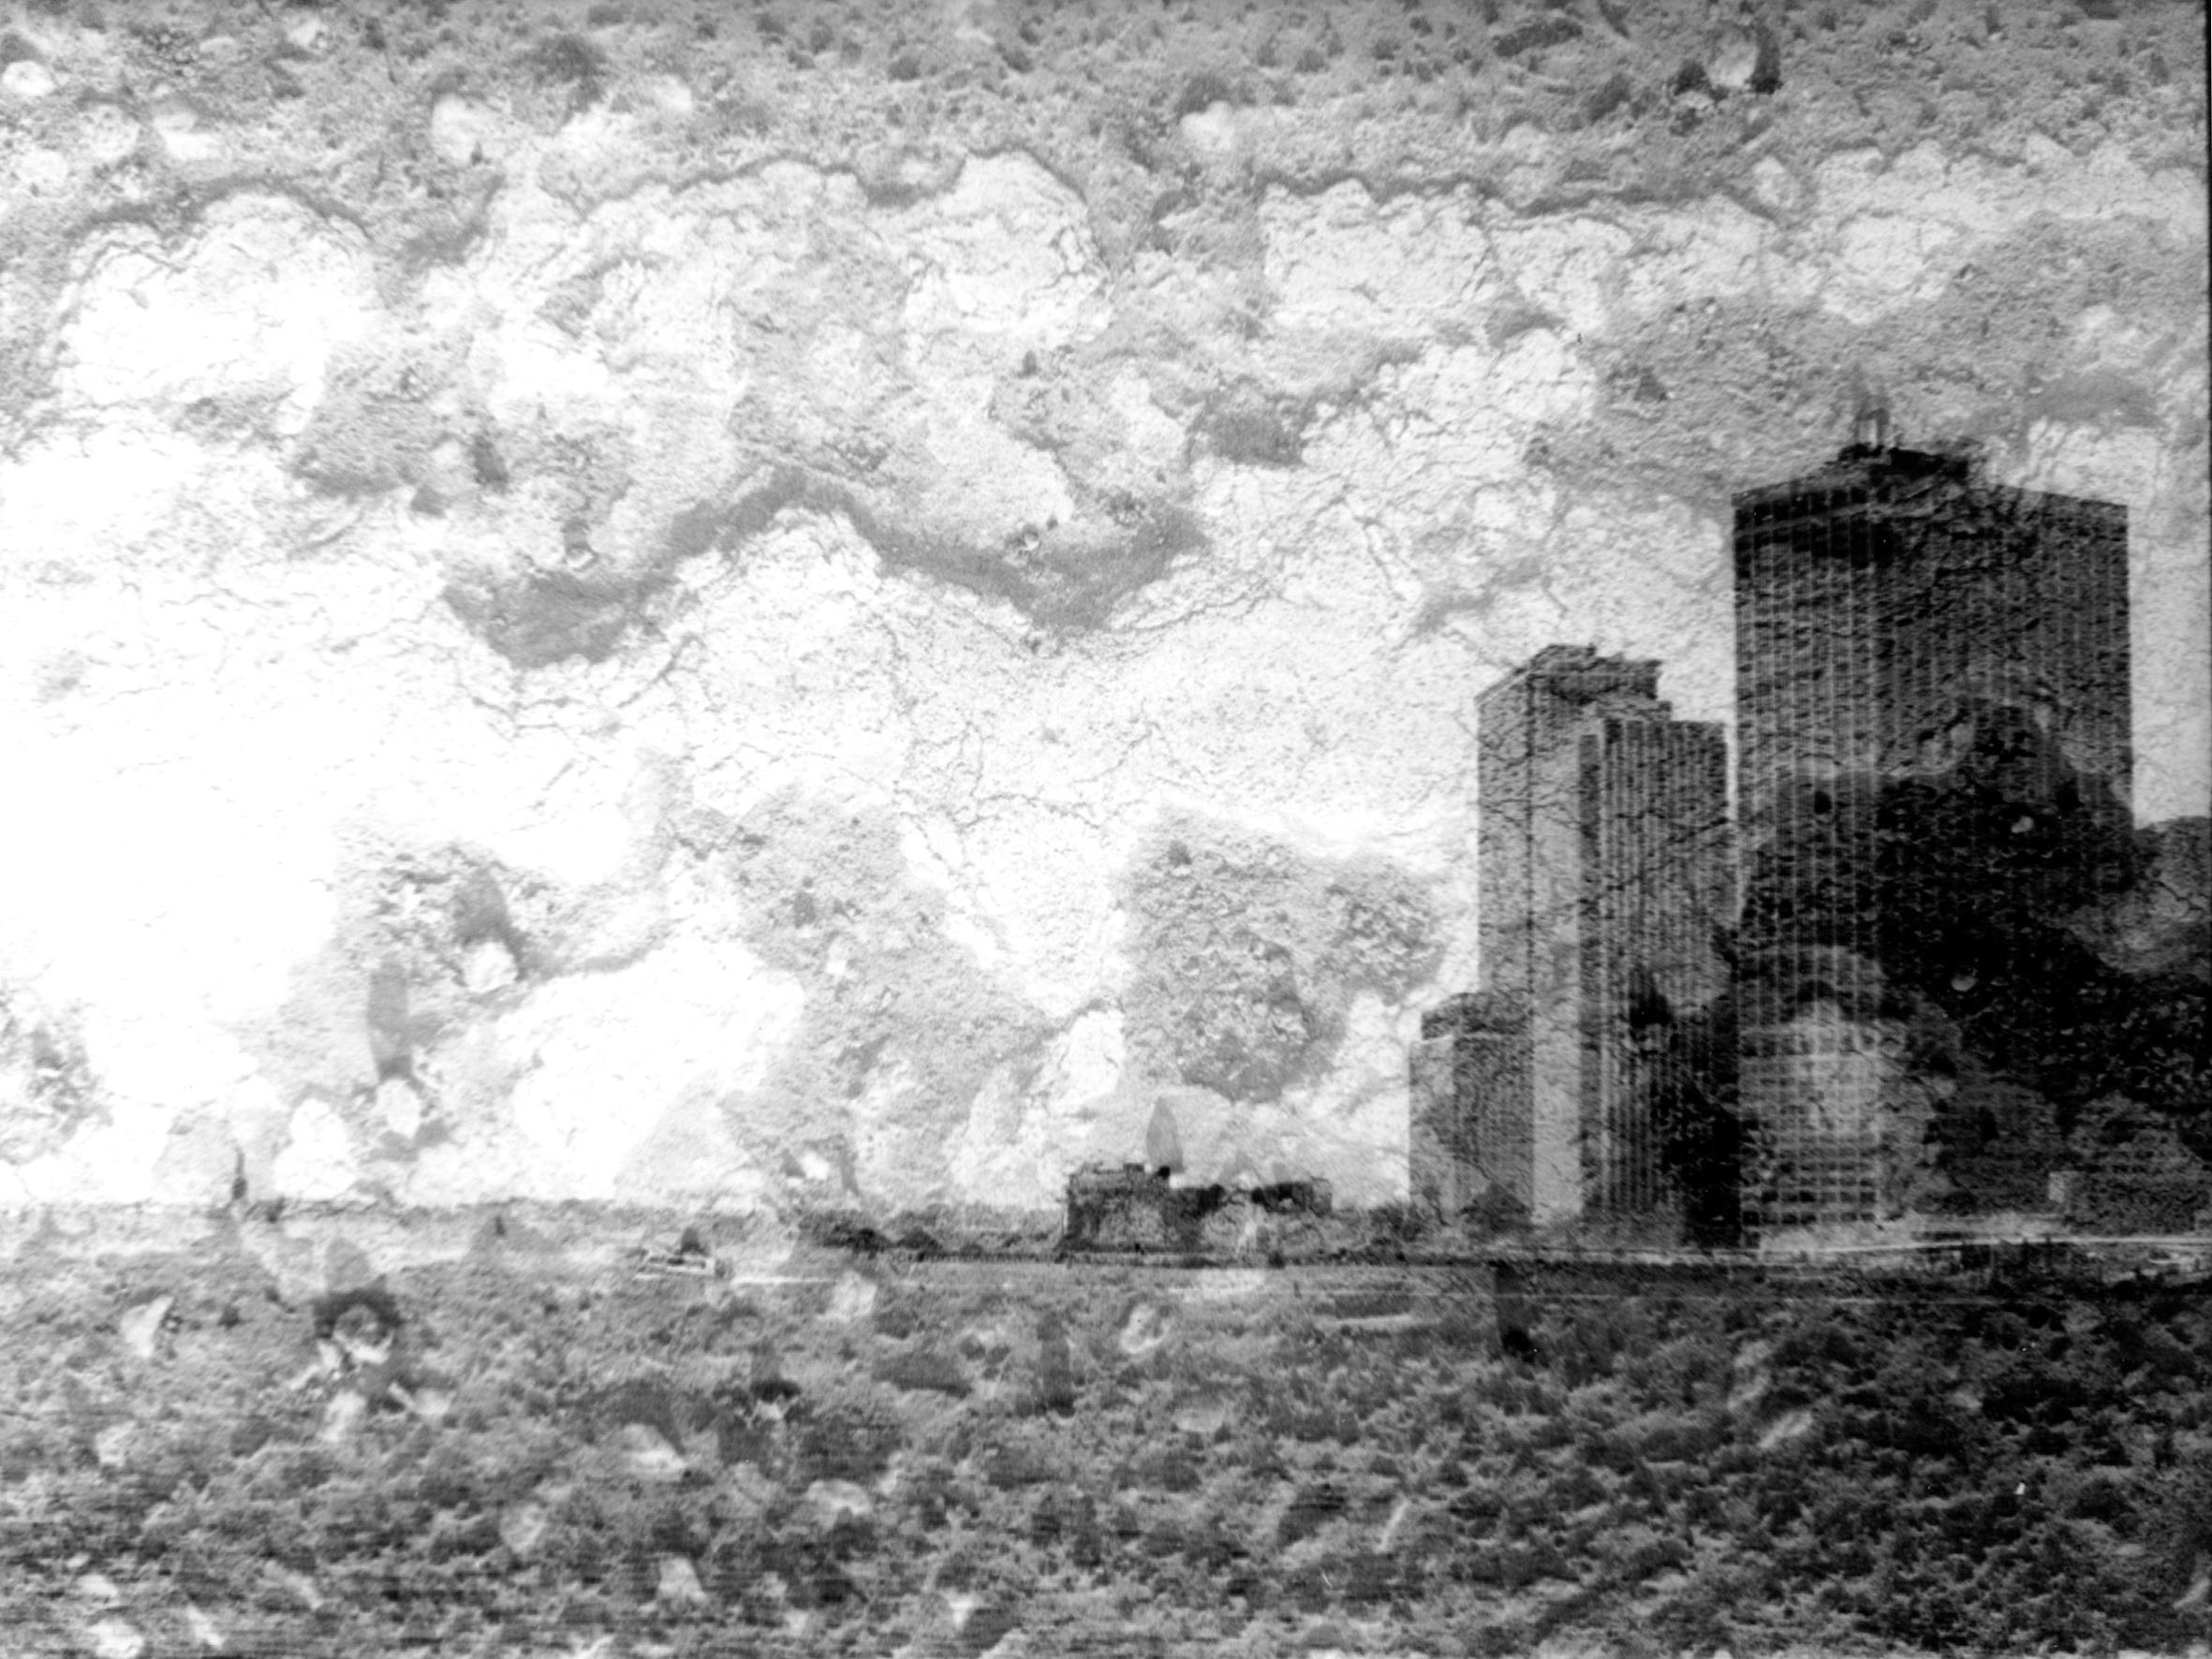 Titel: NY 1, Kunstenaar: Marianne Dardenne - New York